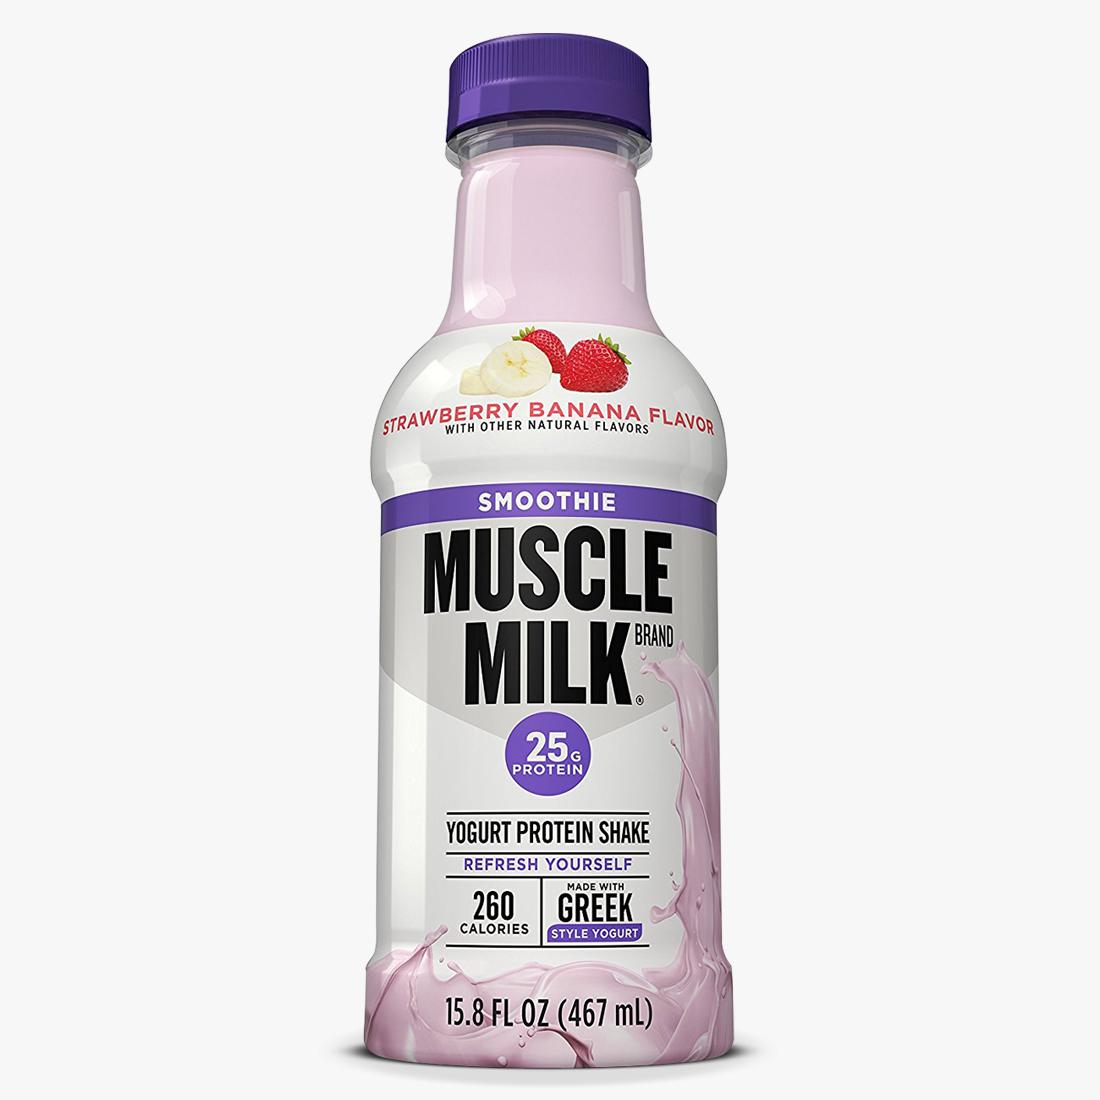 Cytosport - Muscle Milk Smoothie